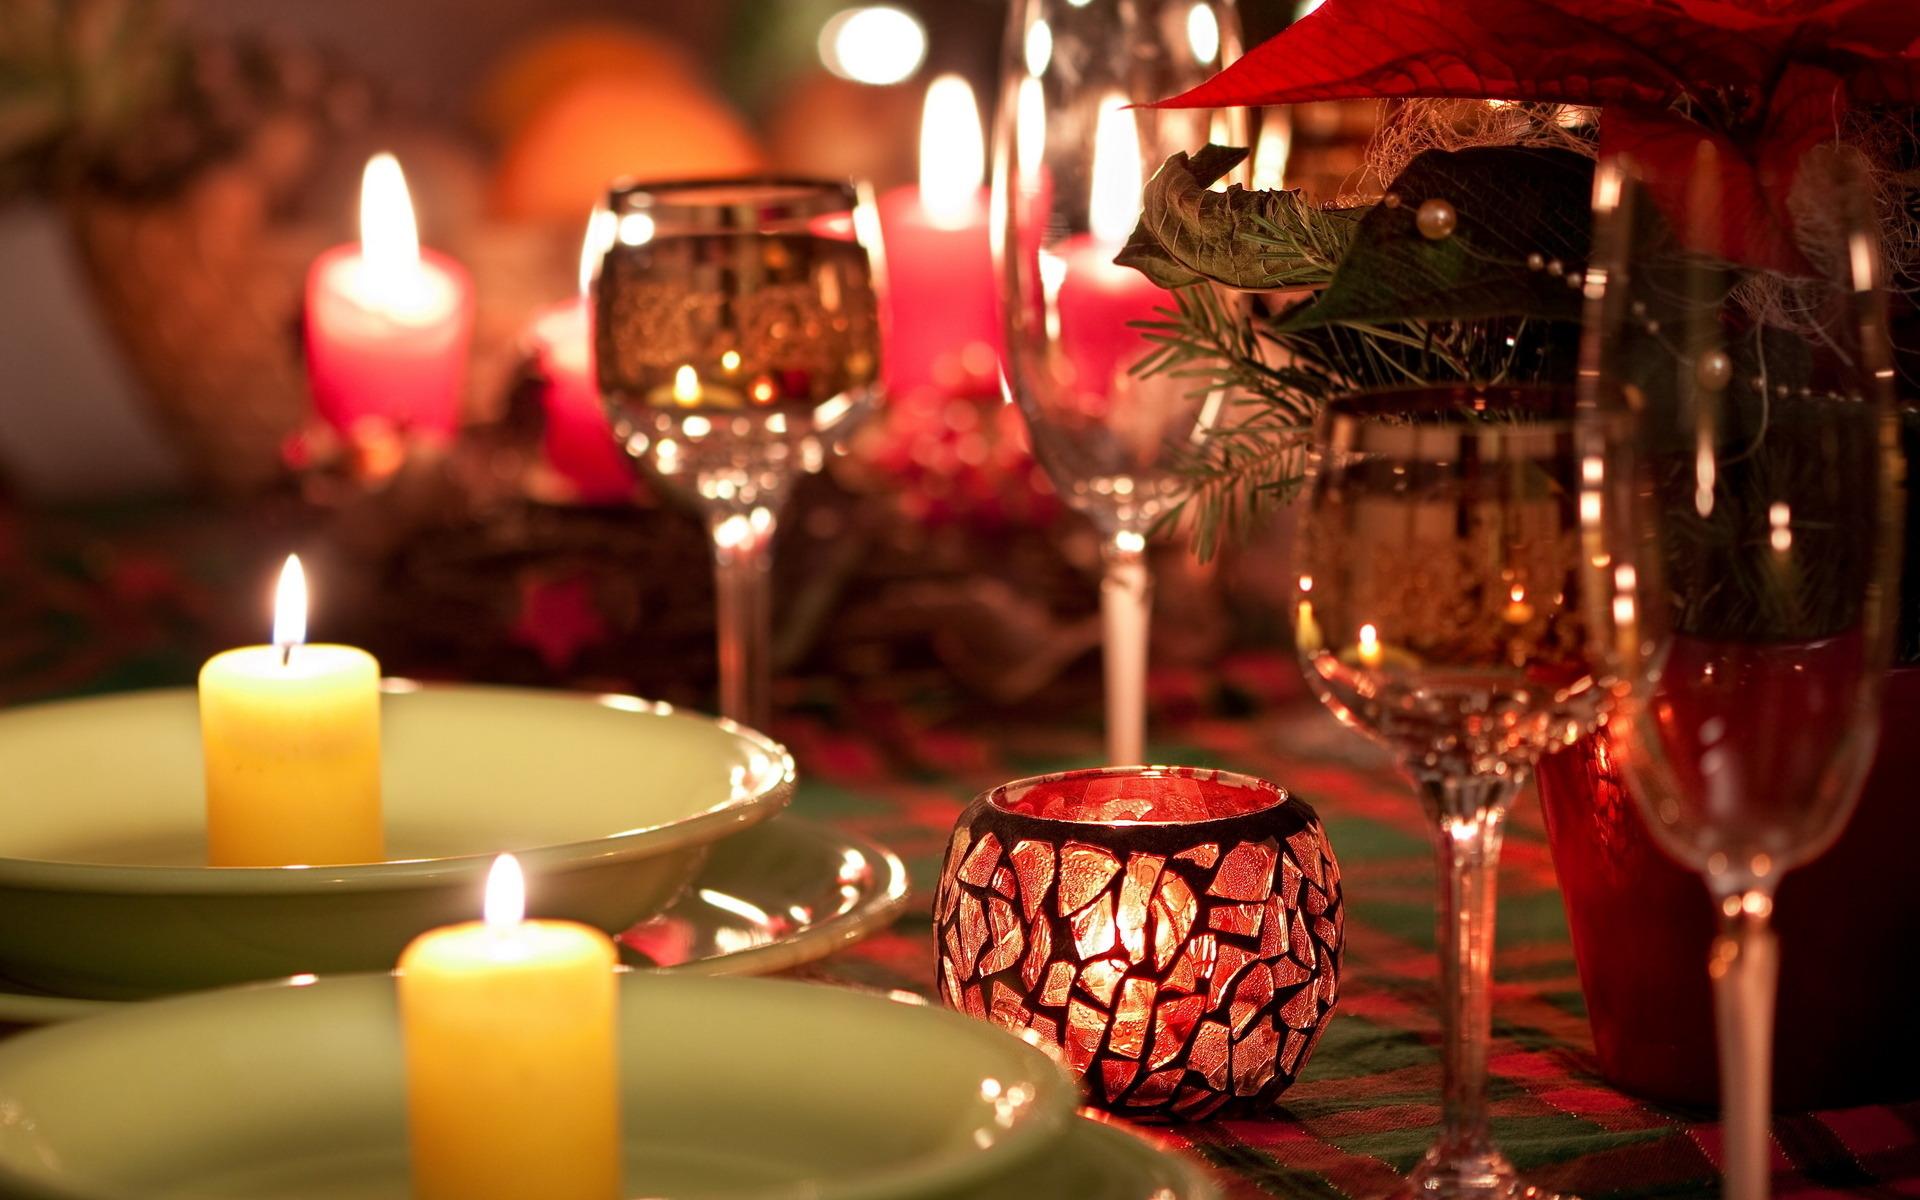 Candlelight dinner wallpaper 44730 45863 hd wallpapers